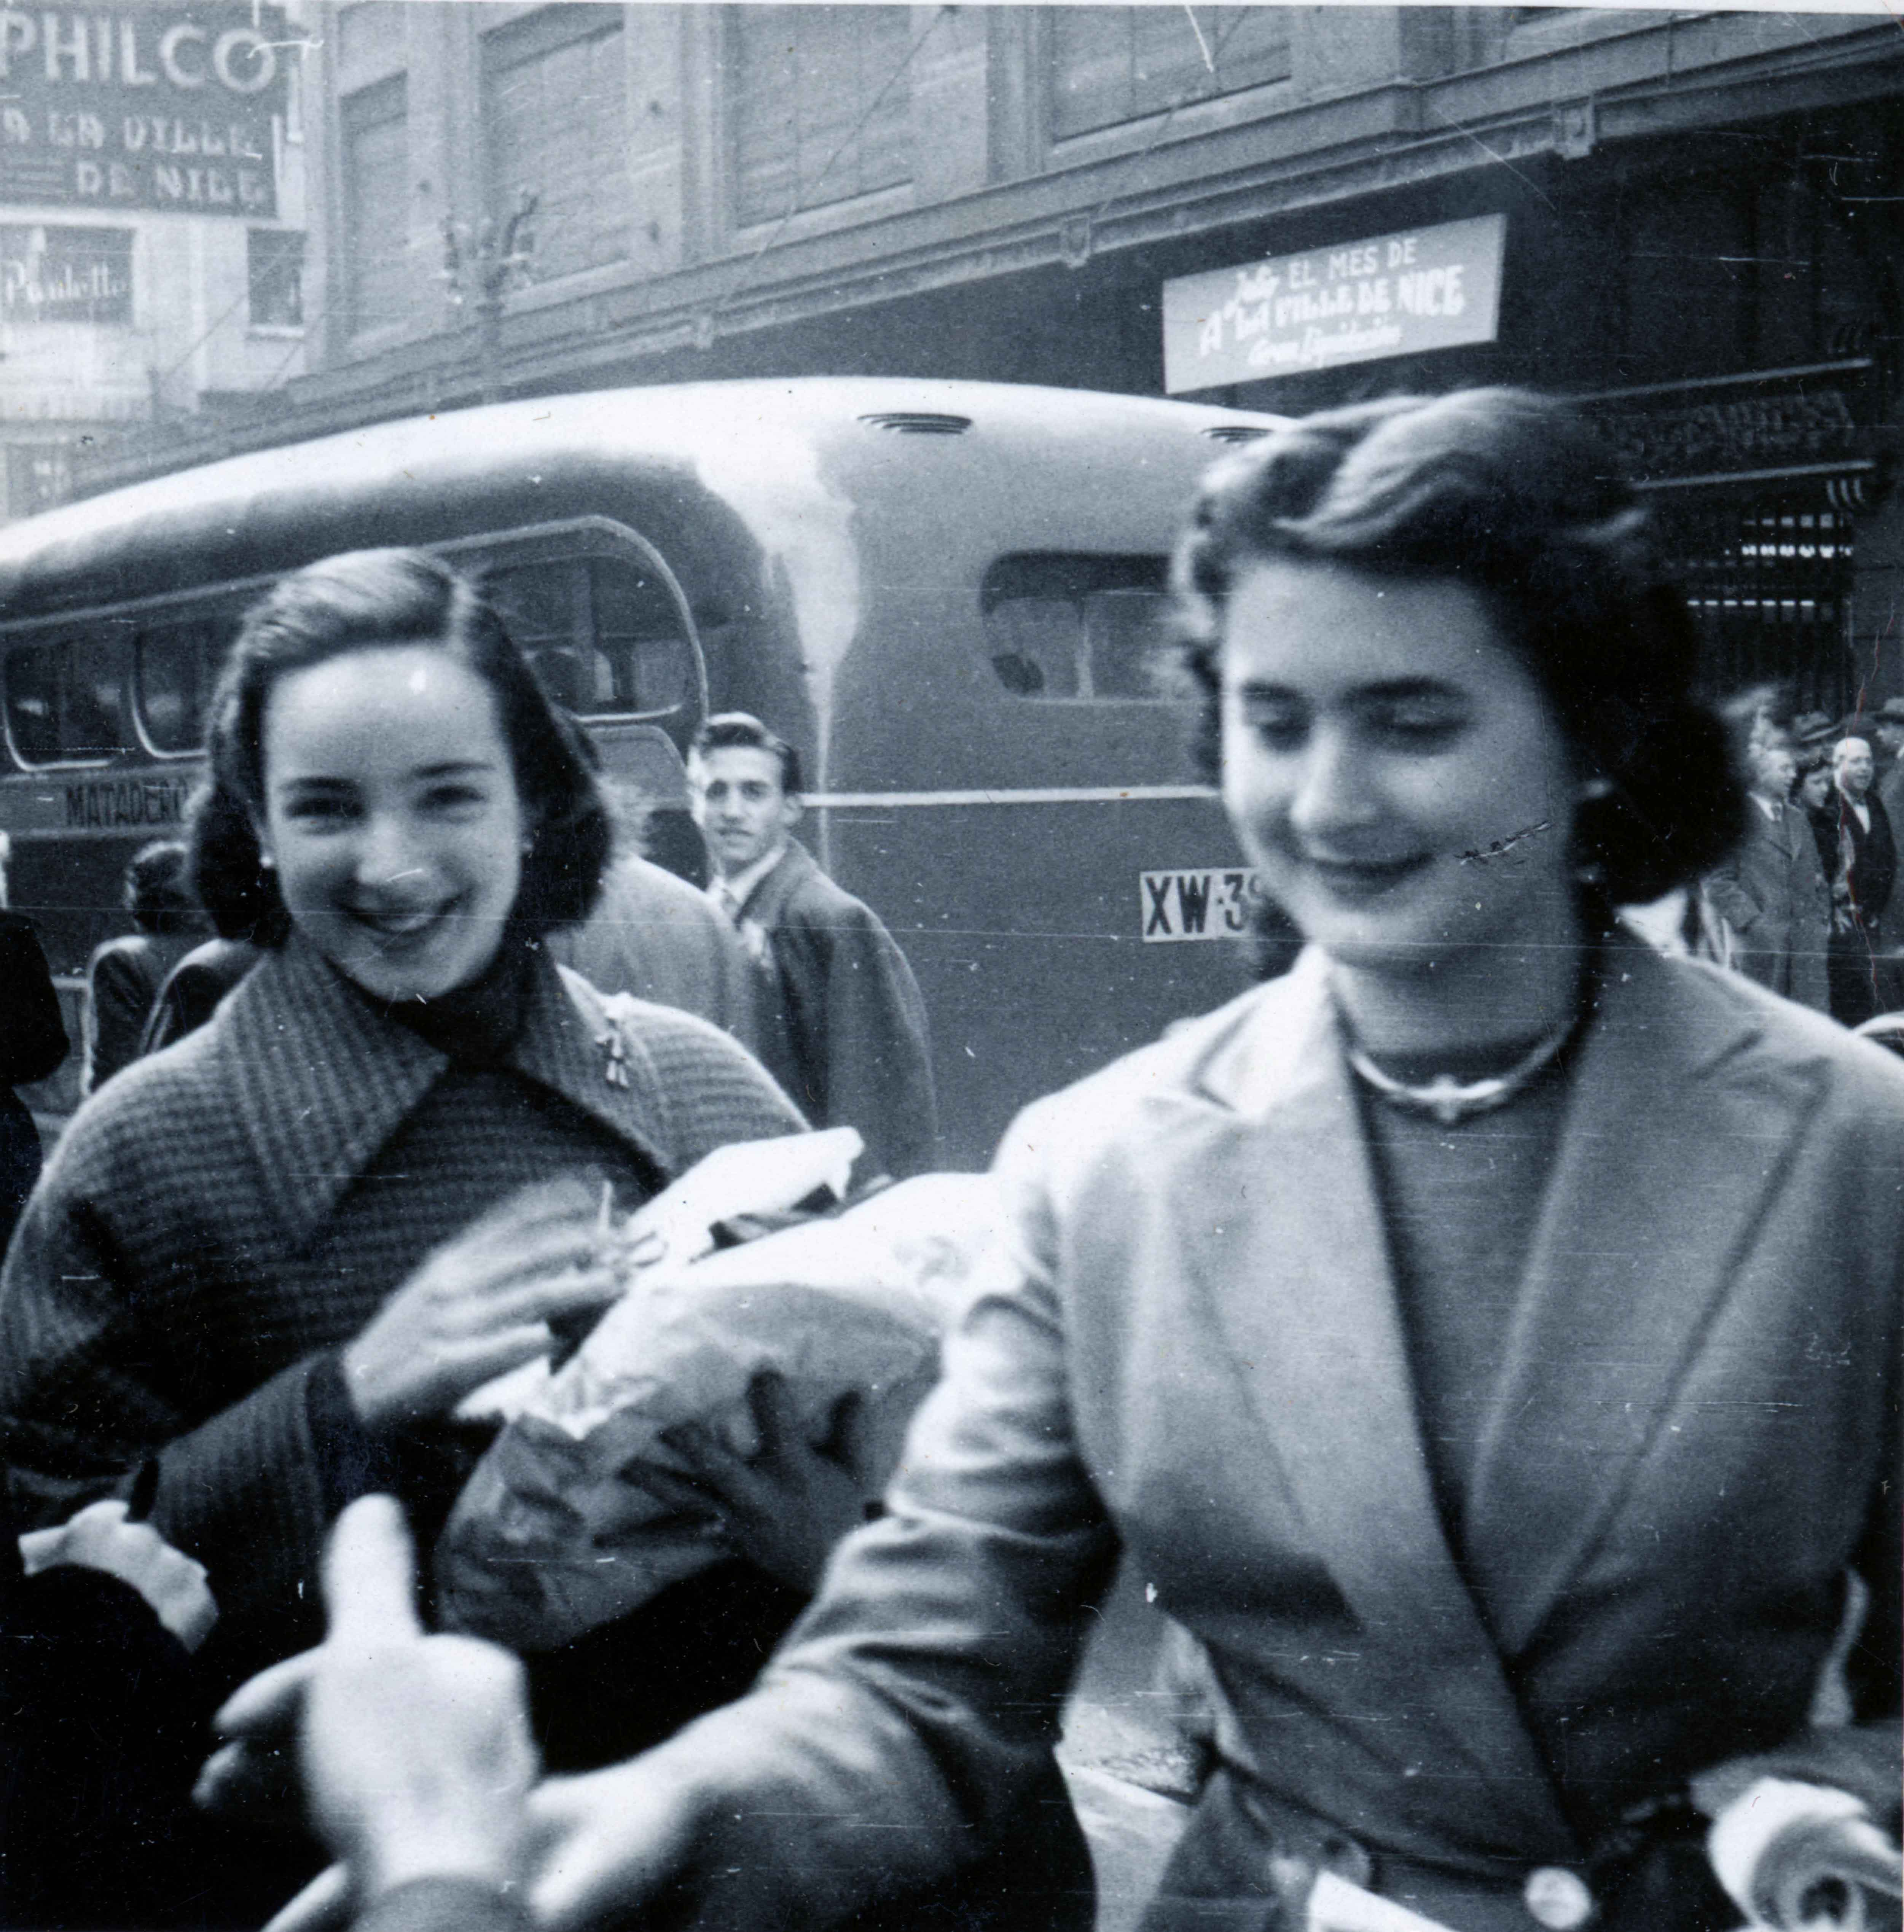 Enterreno - Fotos históricas de chile - fotos antiguas de Chile - Calle Ahumada en 1950